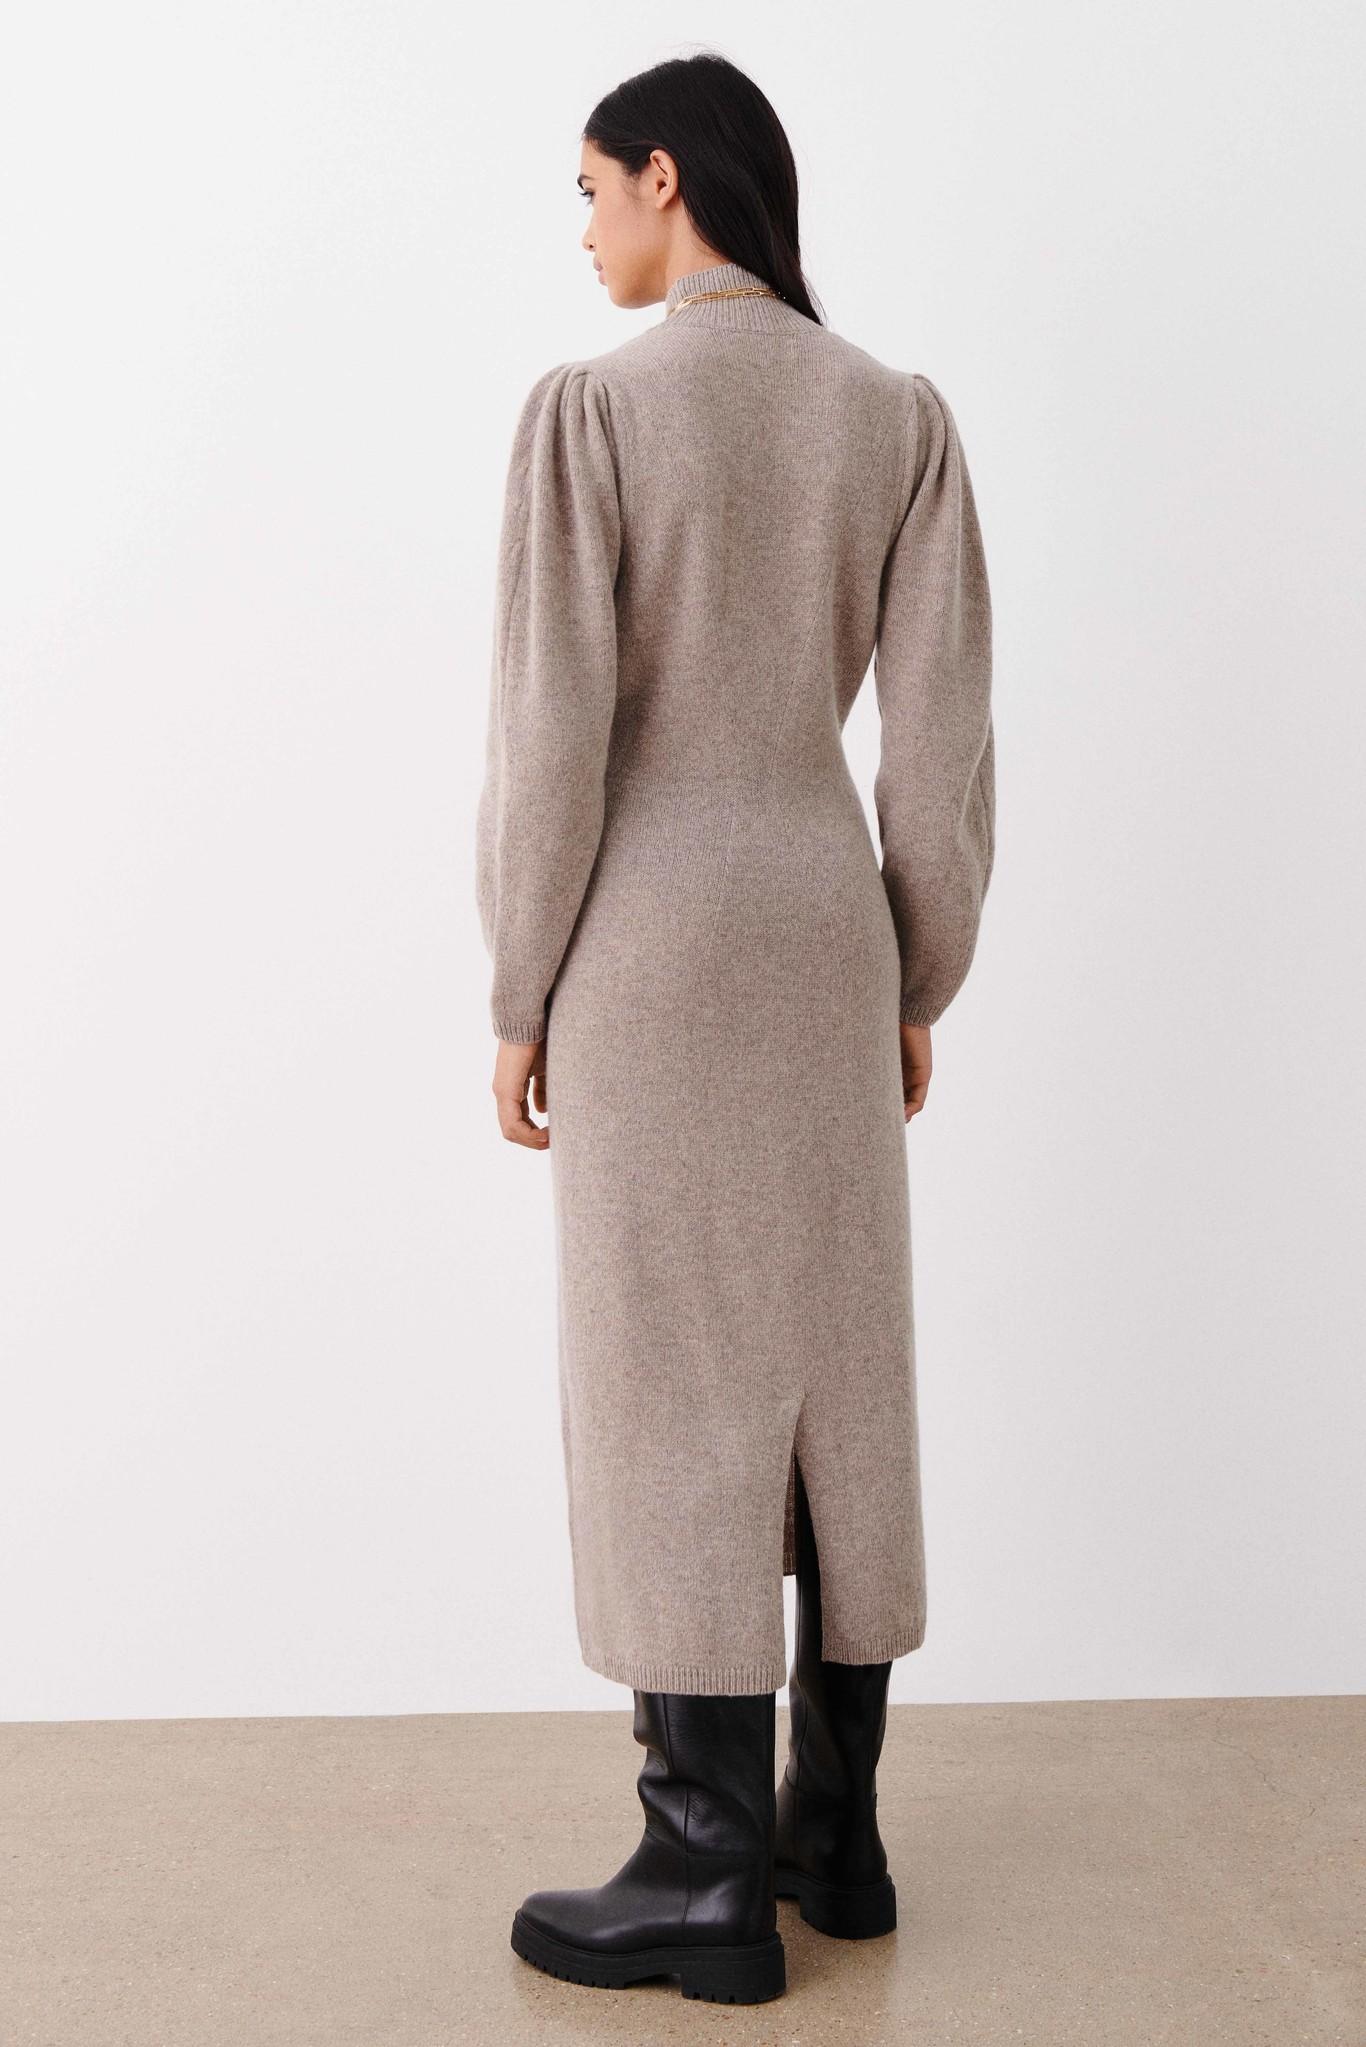 Felicity Dress - Beige-6